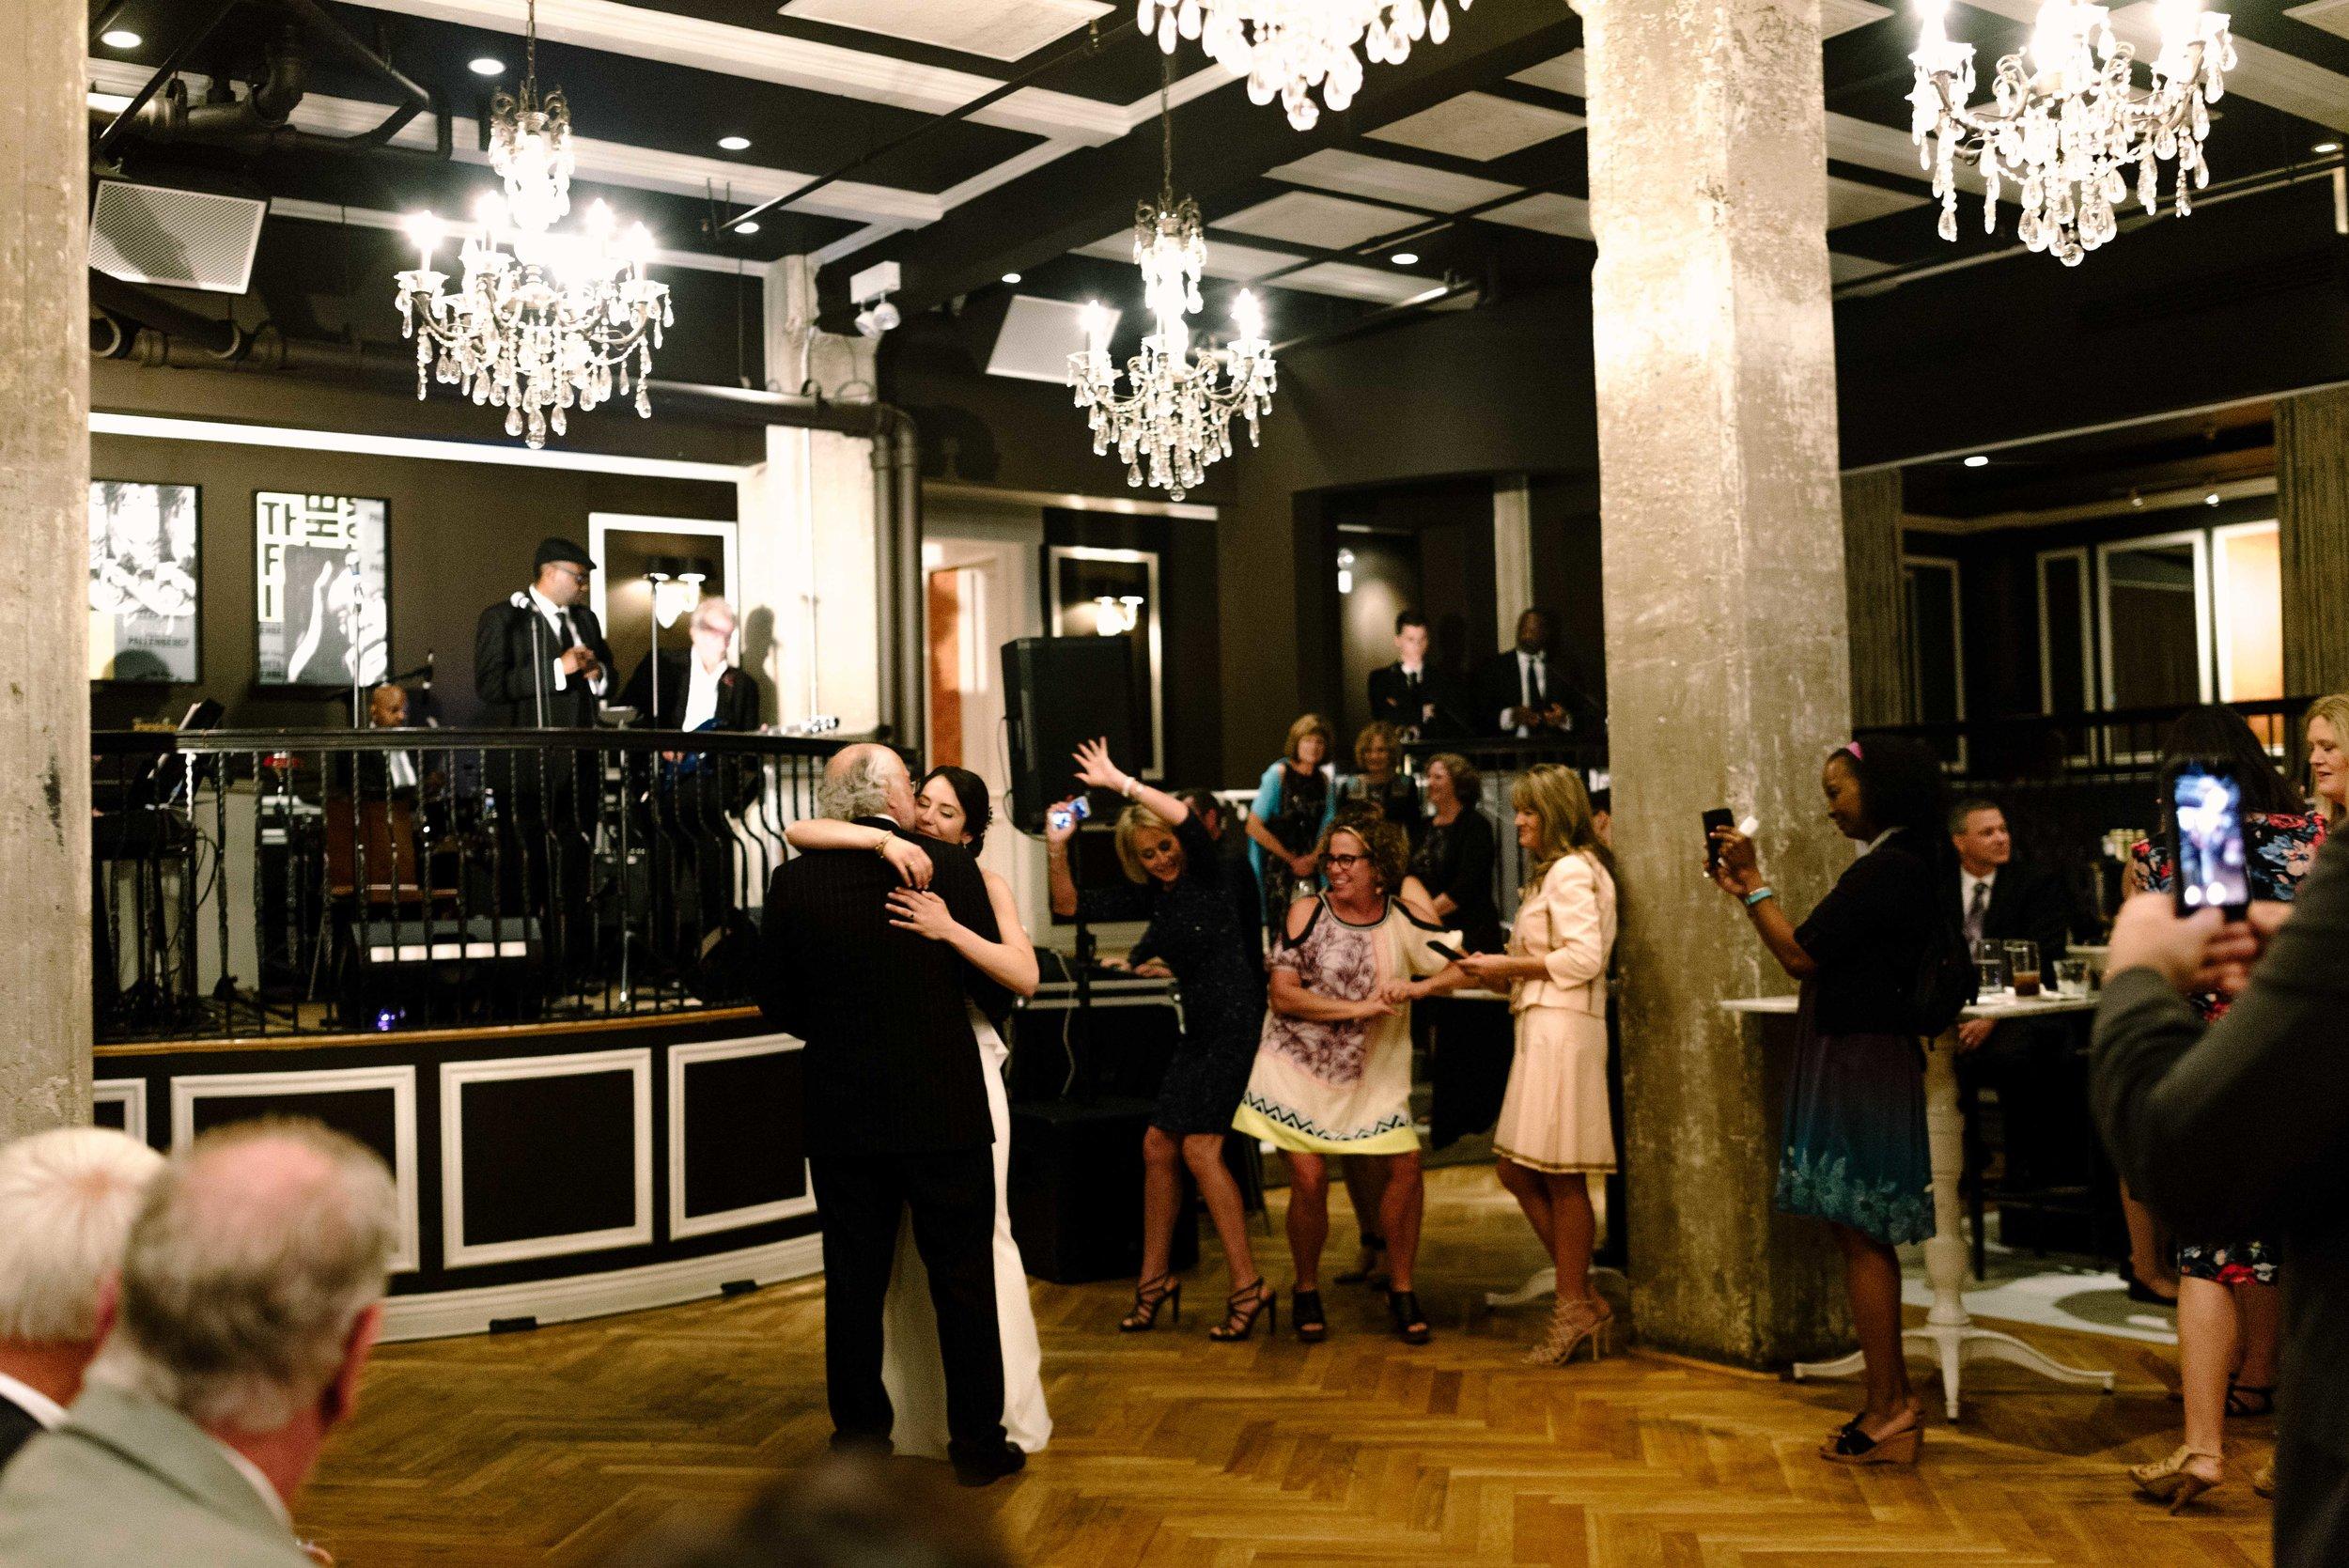 Patricia-Steve-Blog-Indianapolis-Wedding-119.jpg